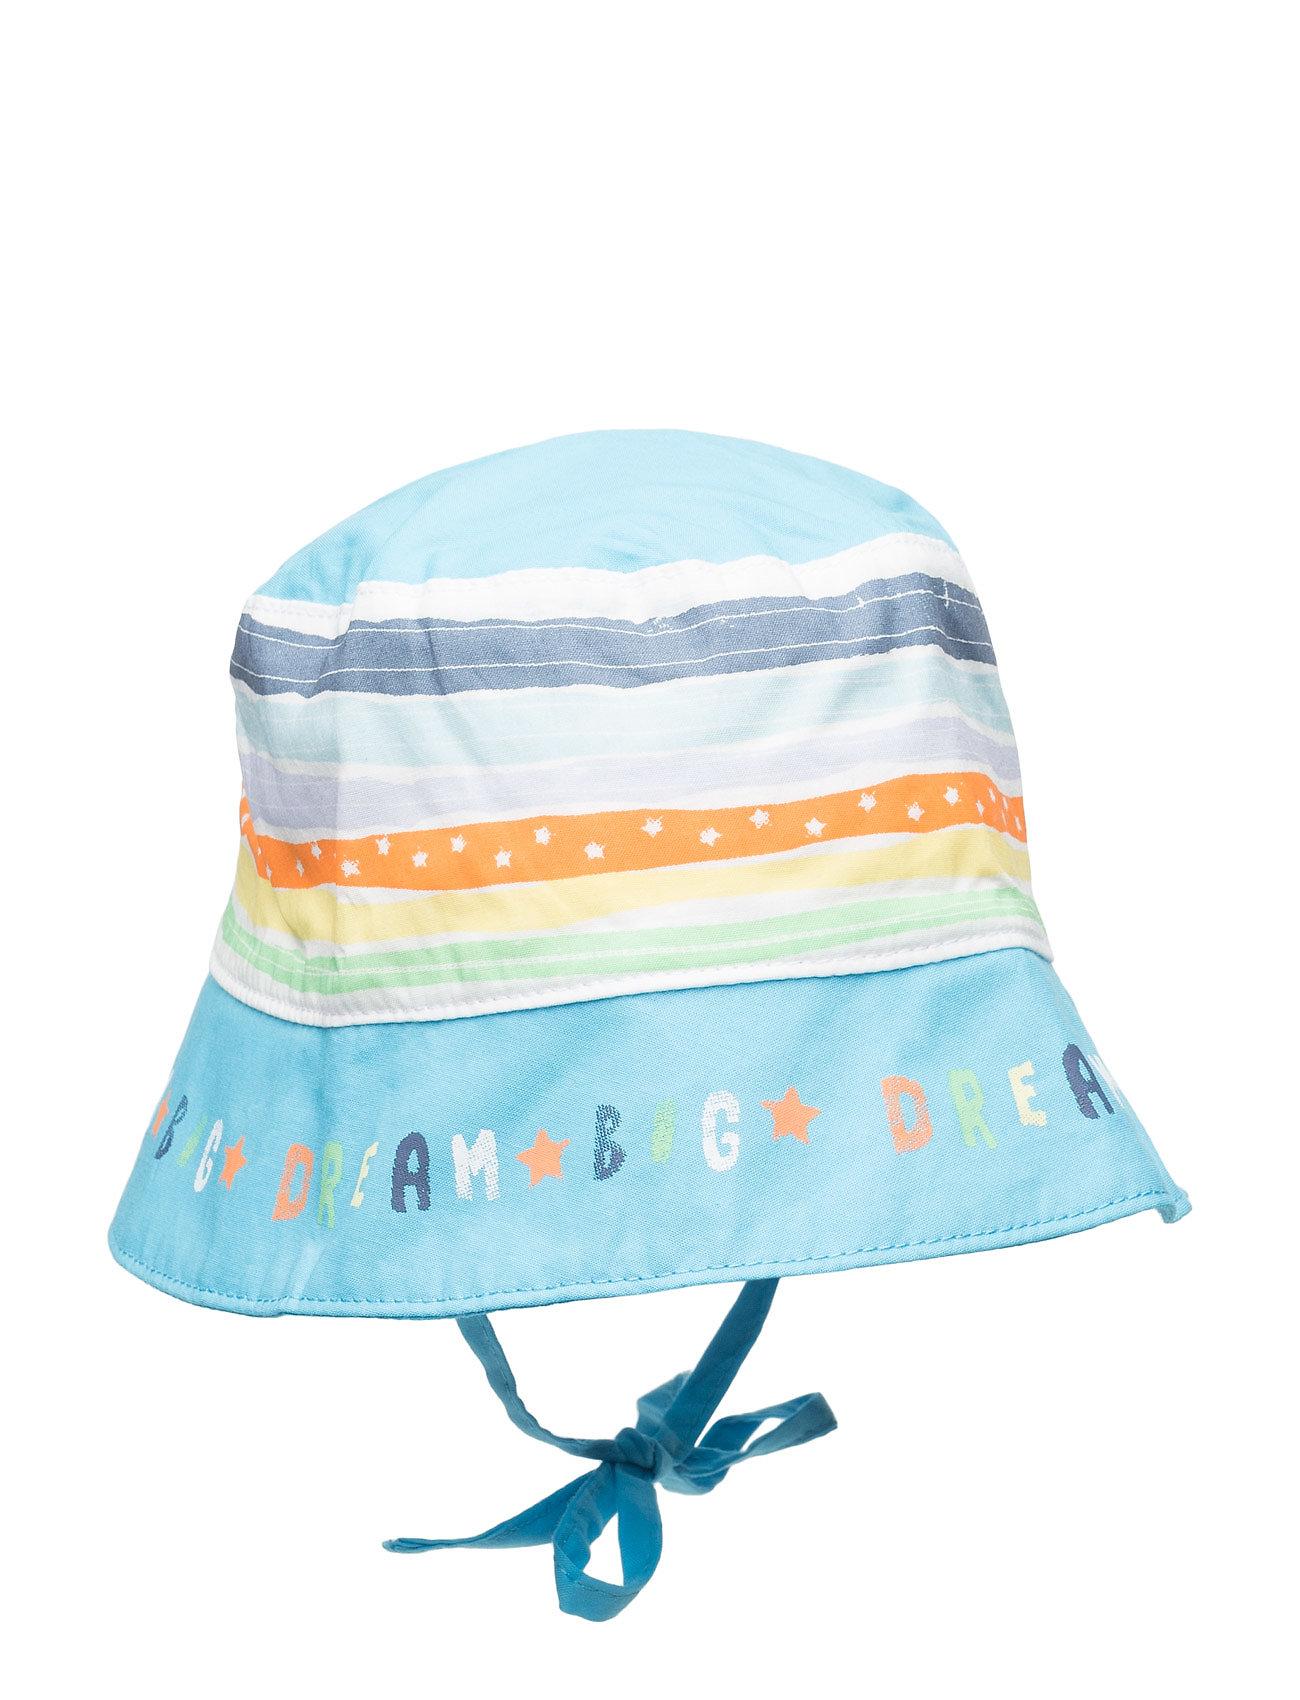 Hat United Colors of Benetton Baby accessories til Børn i